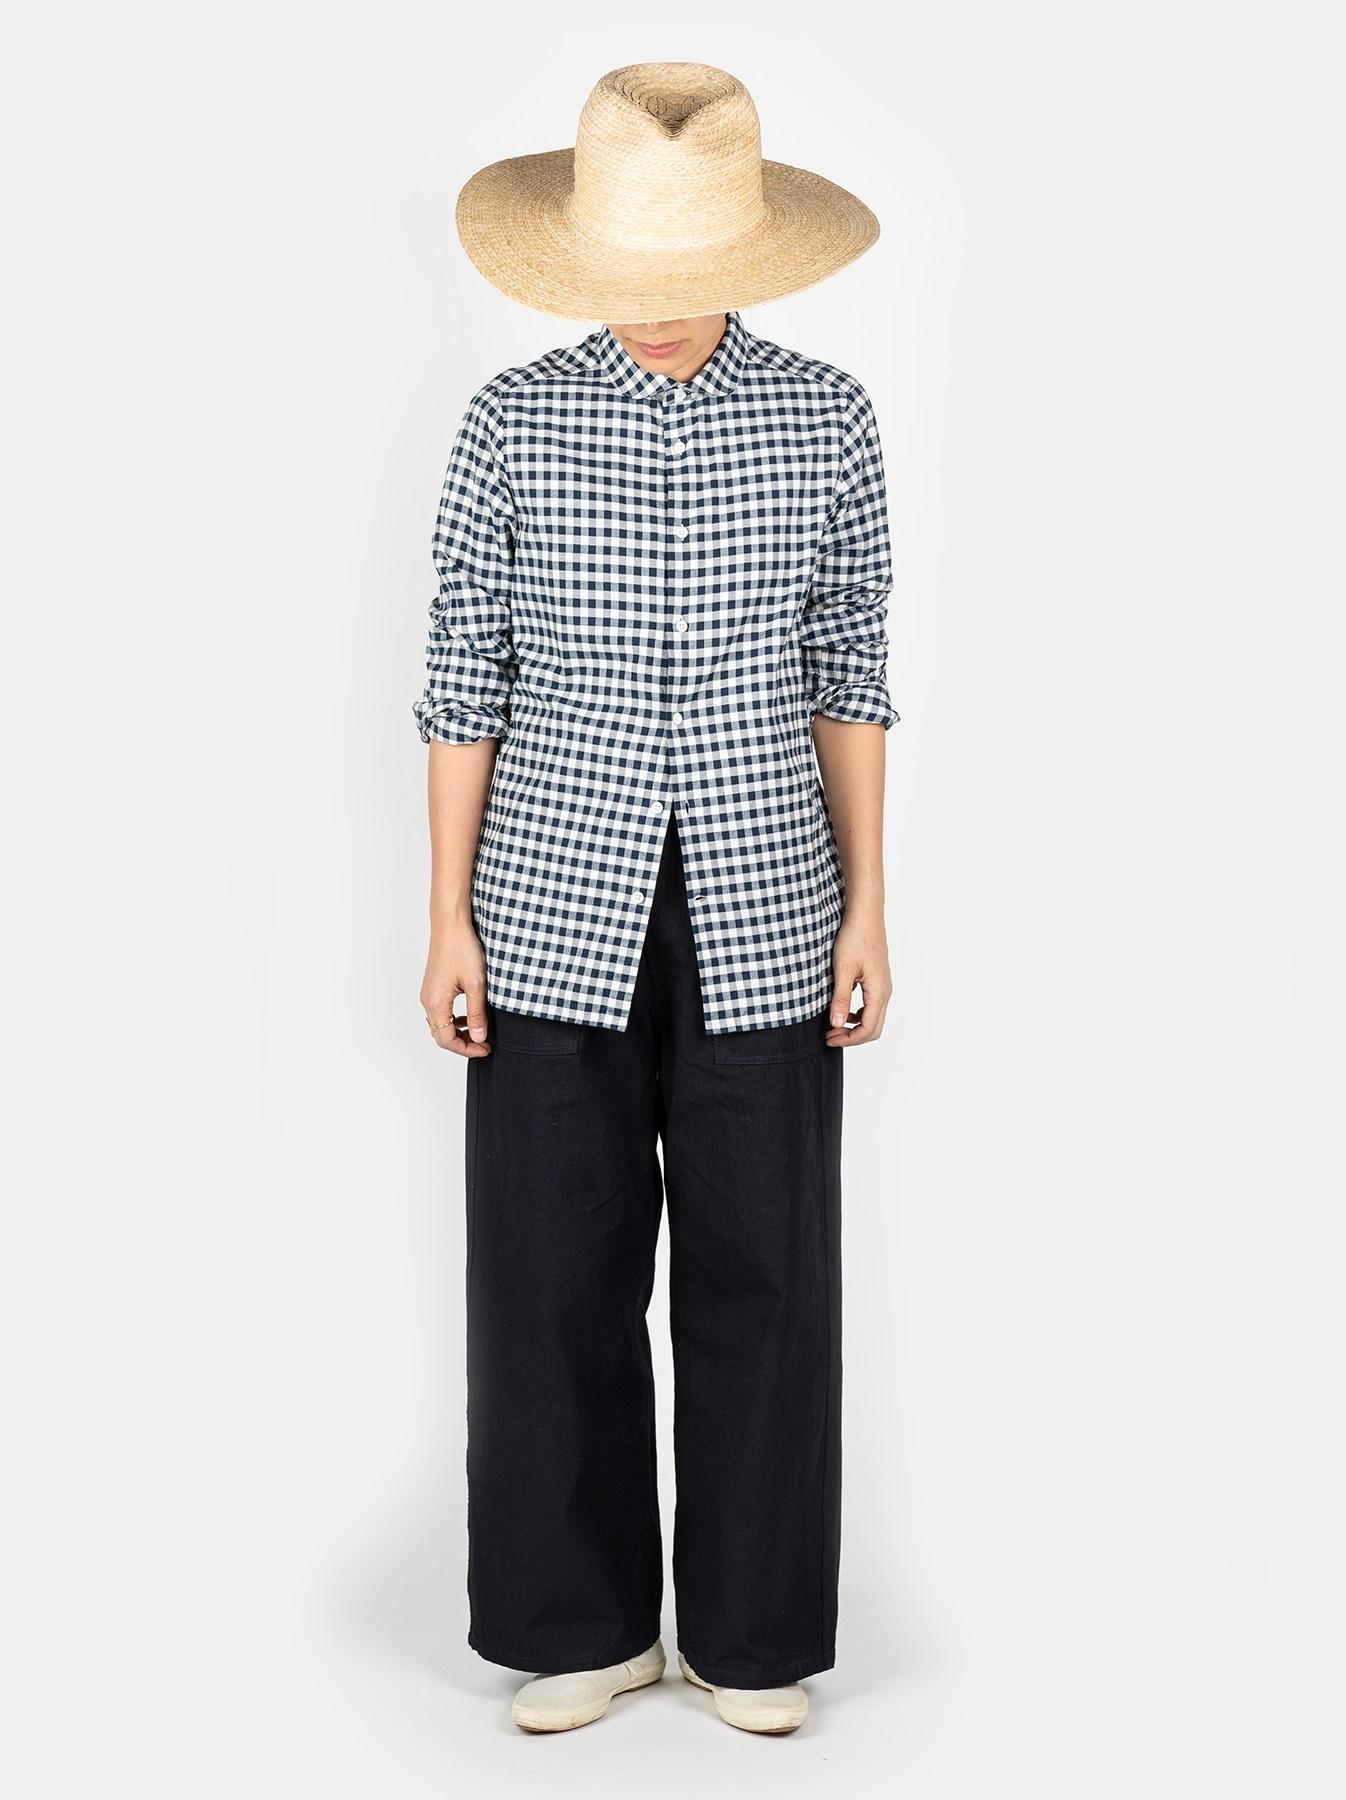 WH Indigo Oxford 908 Round Collar Shirt-3